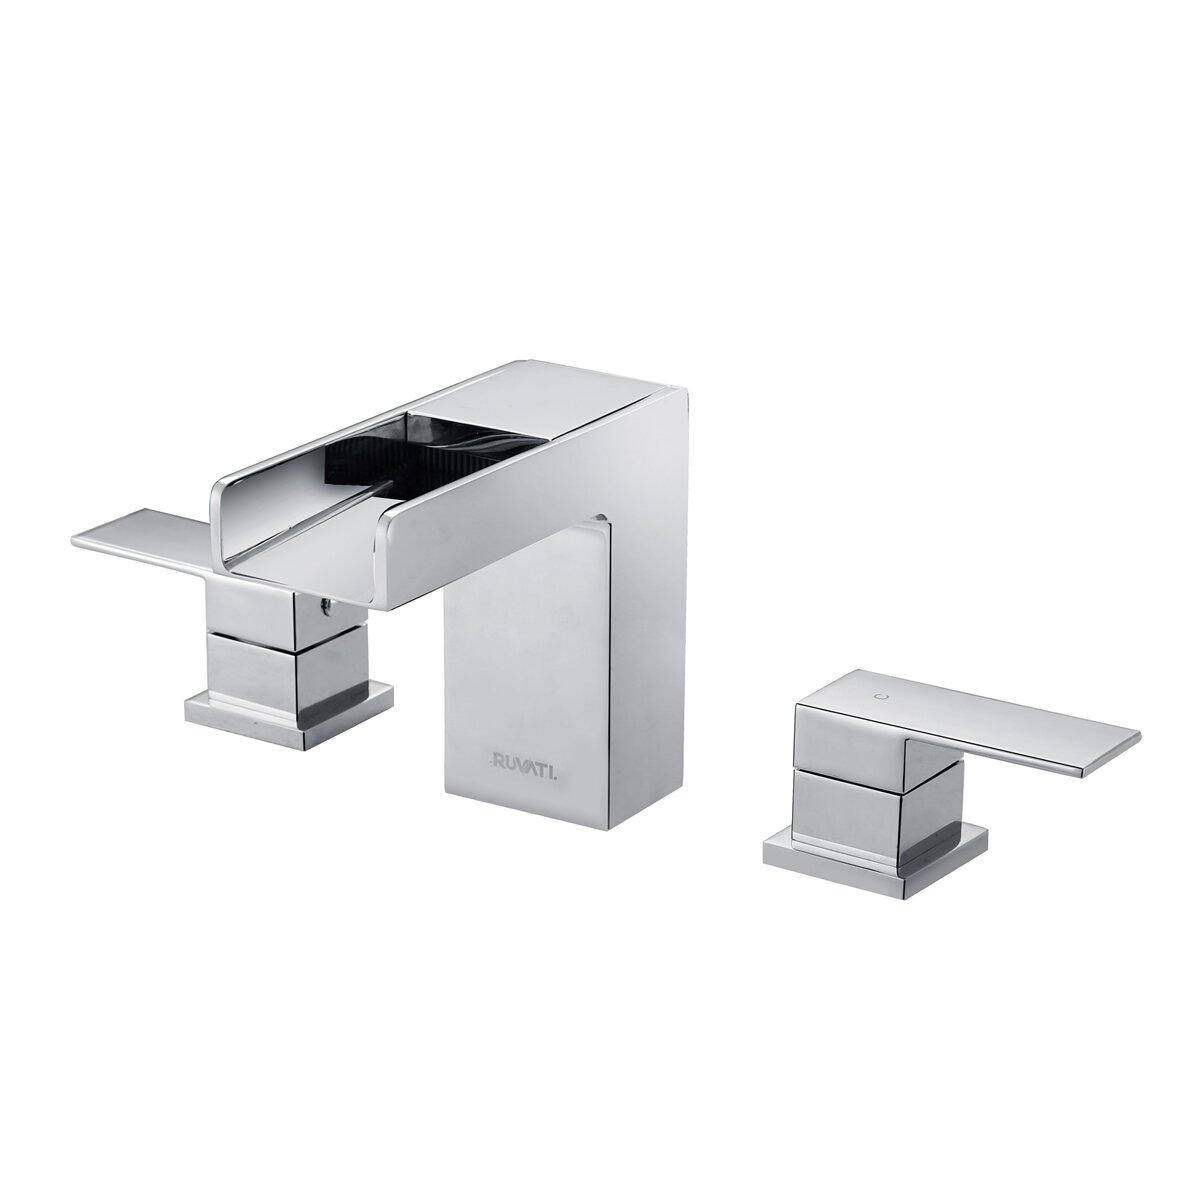 Ruvati Waterfall Double Handle Bathroom Faucet Amp Reviews Wayfair. Best Bathroom Faucet Reviews   EnWe us